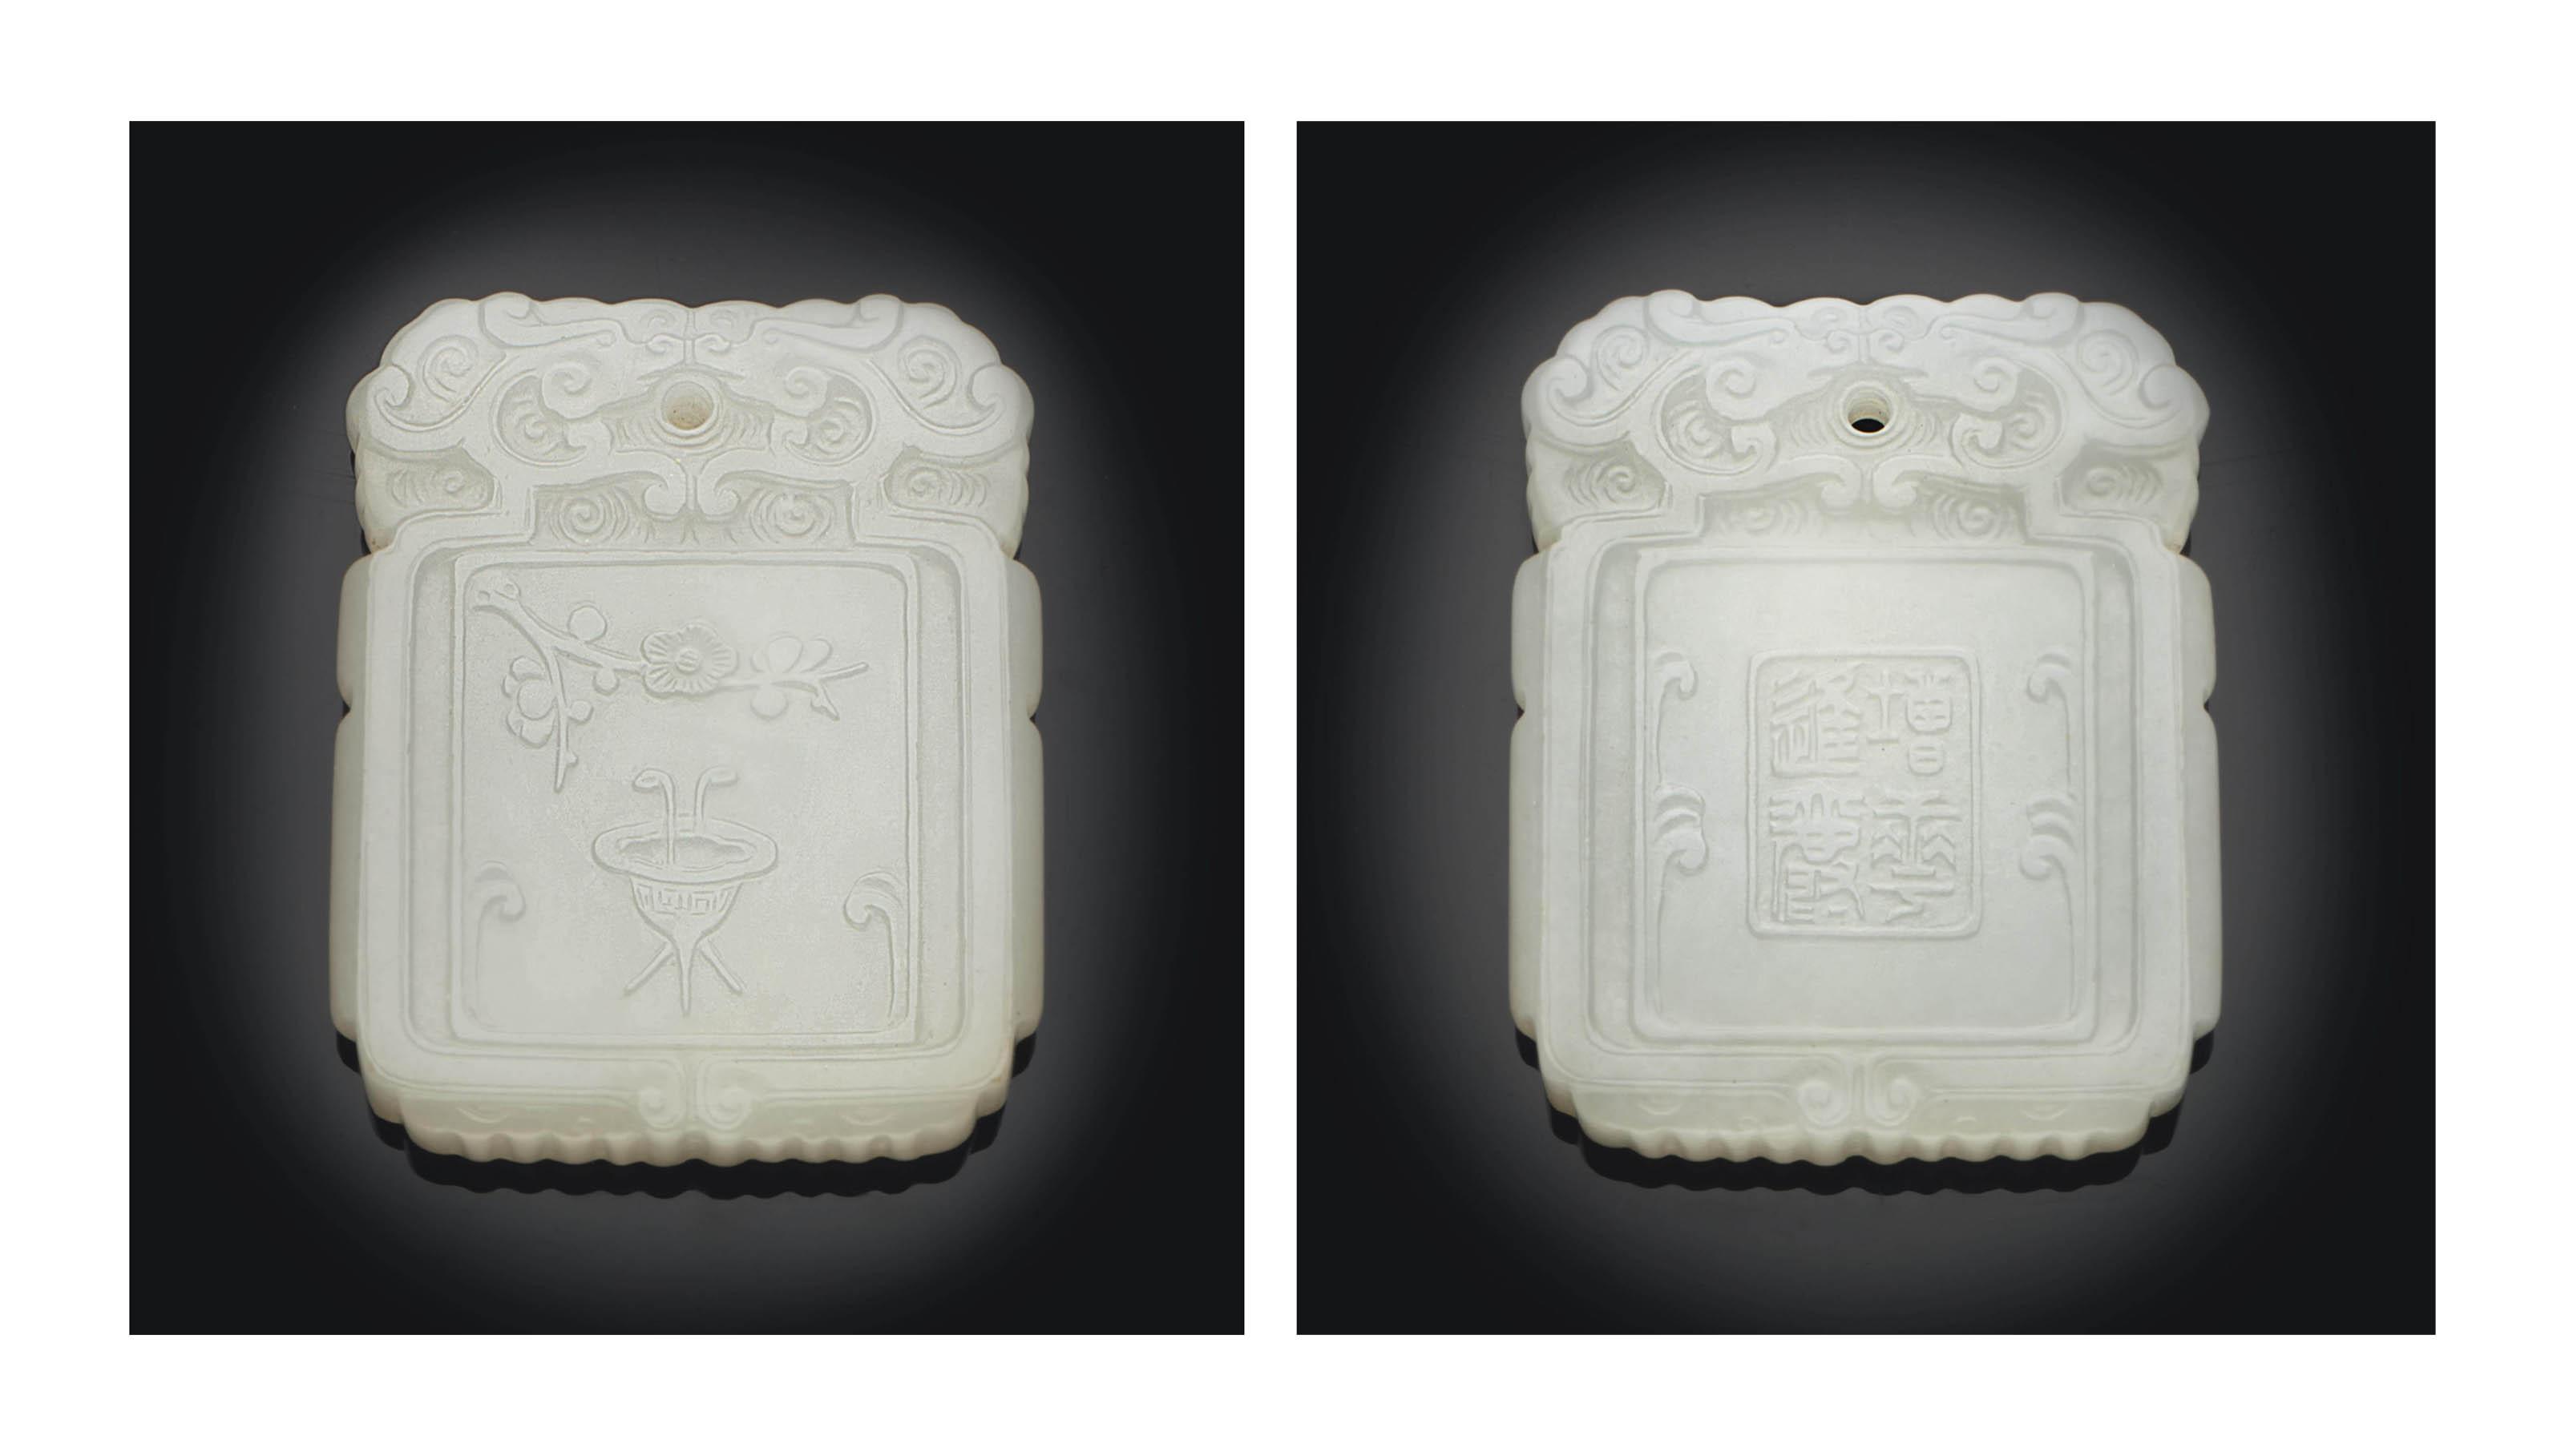 A SMALL WHITE JADE PENDANT